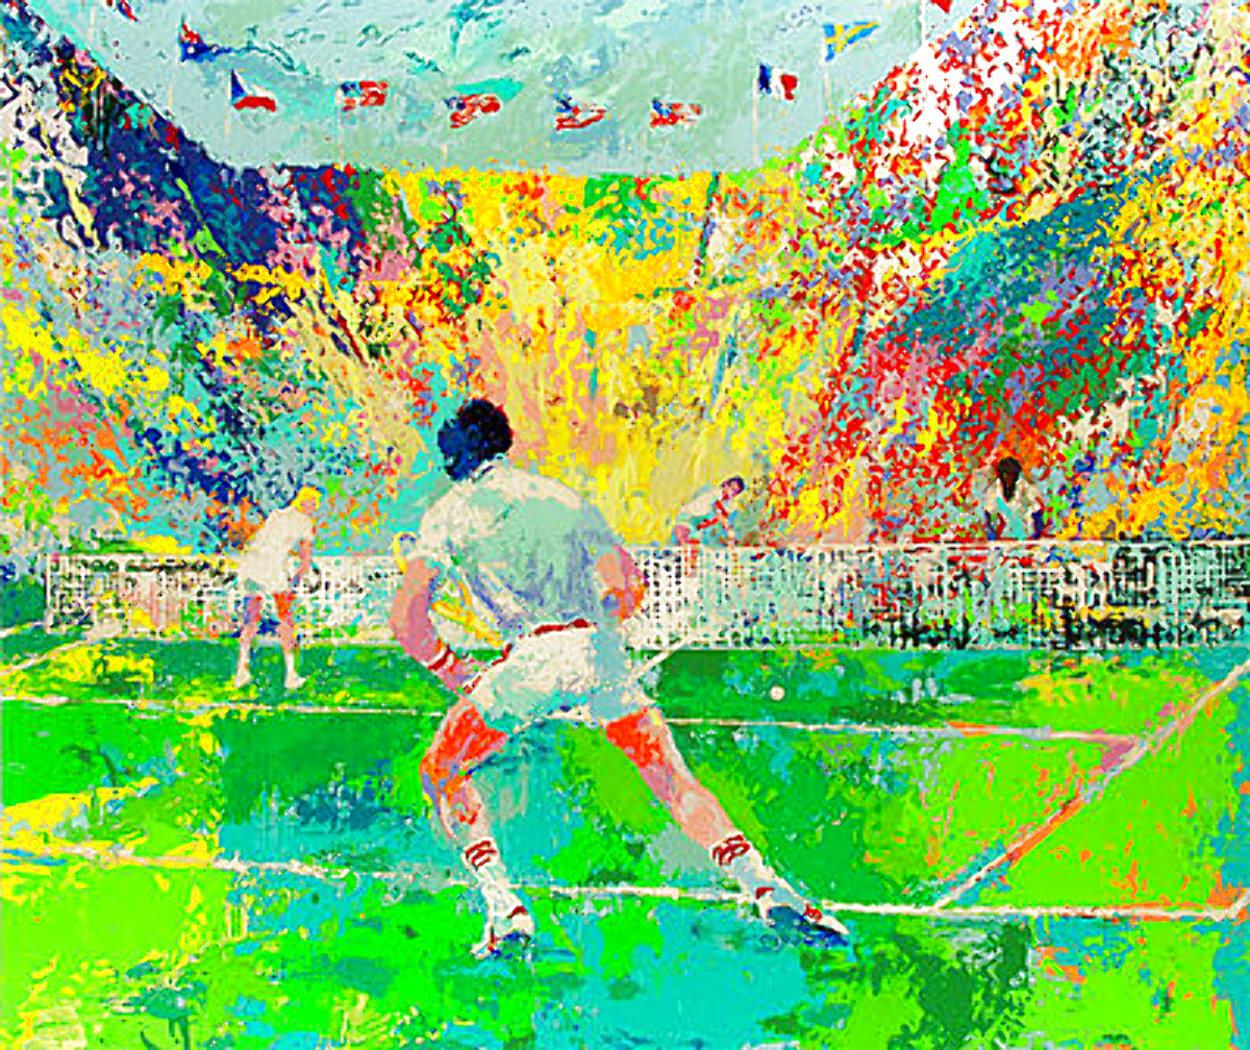 Stadium Tennis AP 1981 Limited Edition Print by LeRoy Neiman